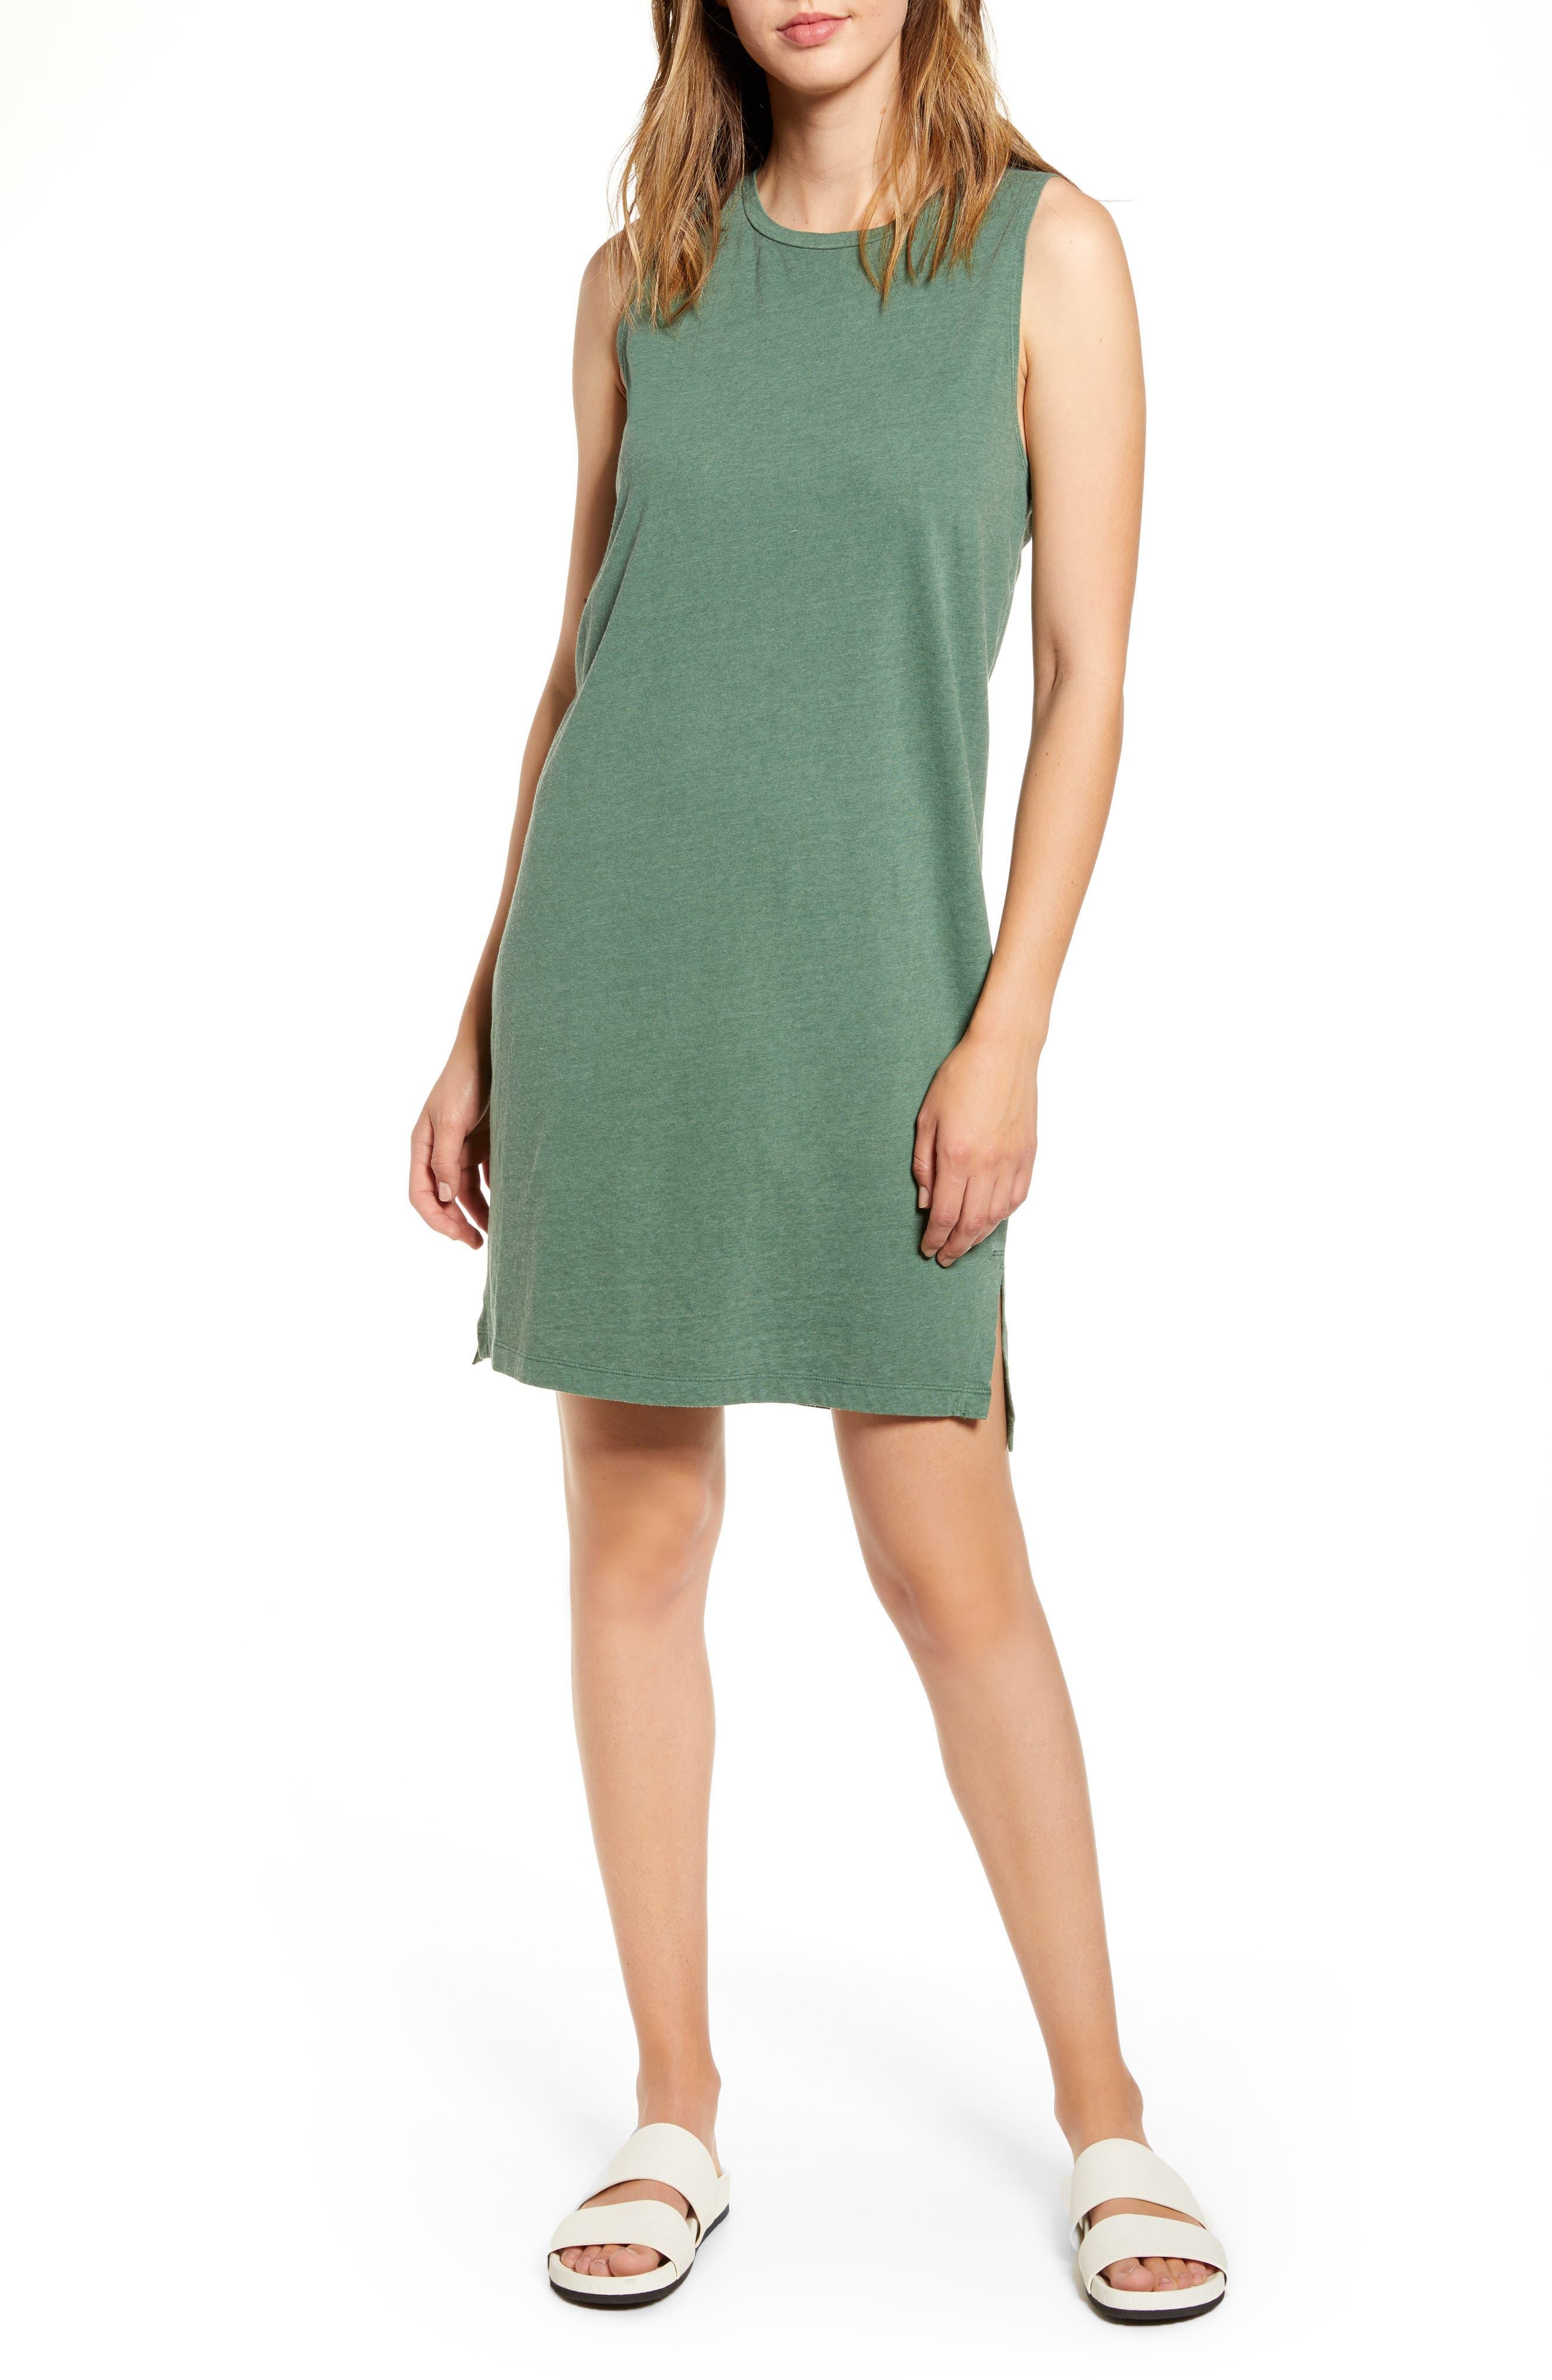 Lou & Grey Softserve Slub Tank Dress, Green